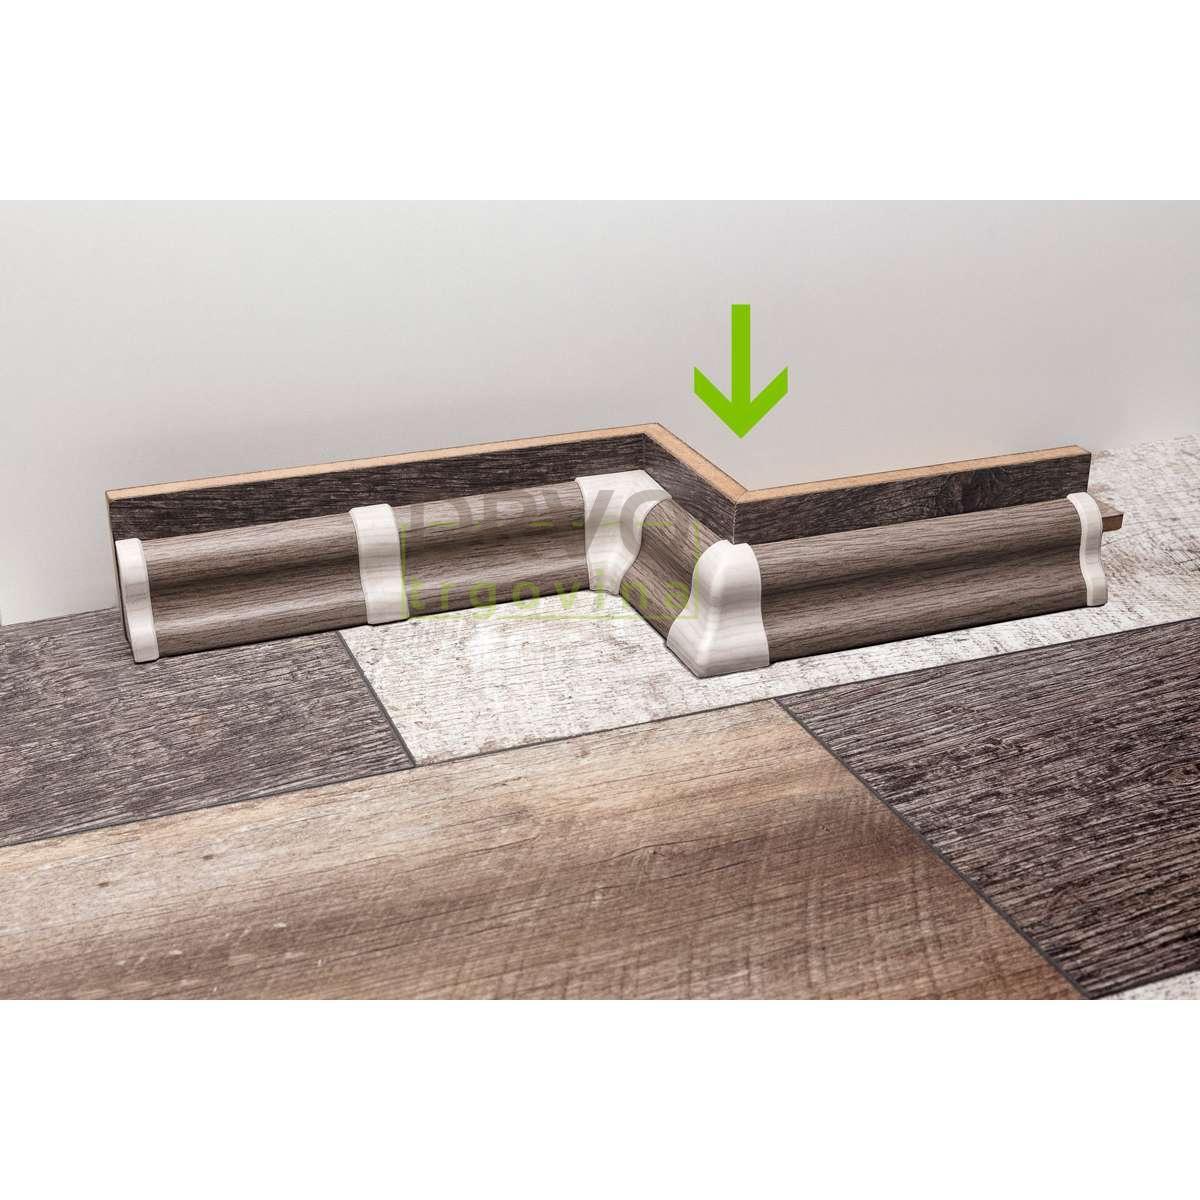 PVC KUT VANJSKI ZA LETVICU  P27 HRAST(DAB-10)